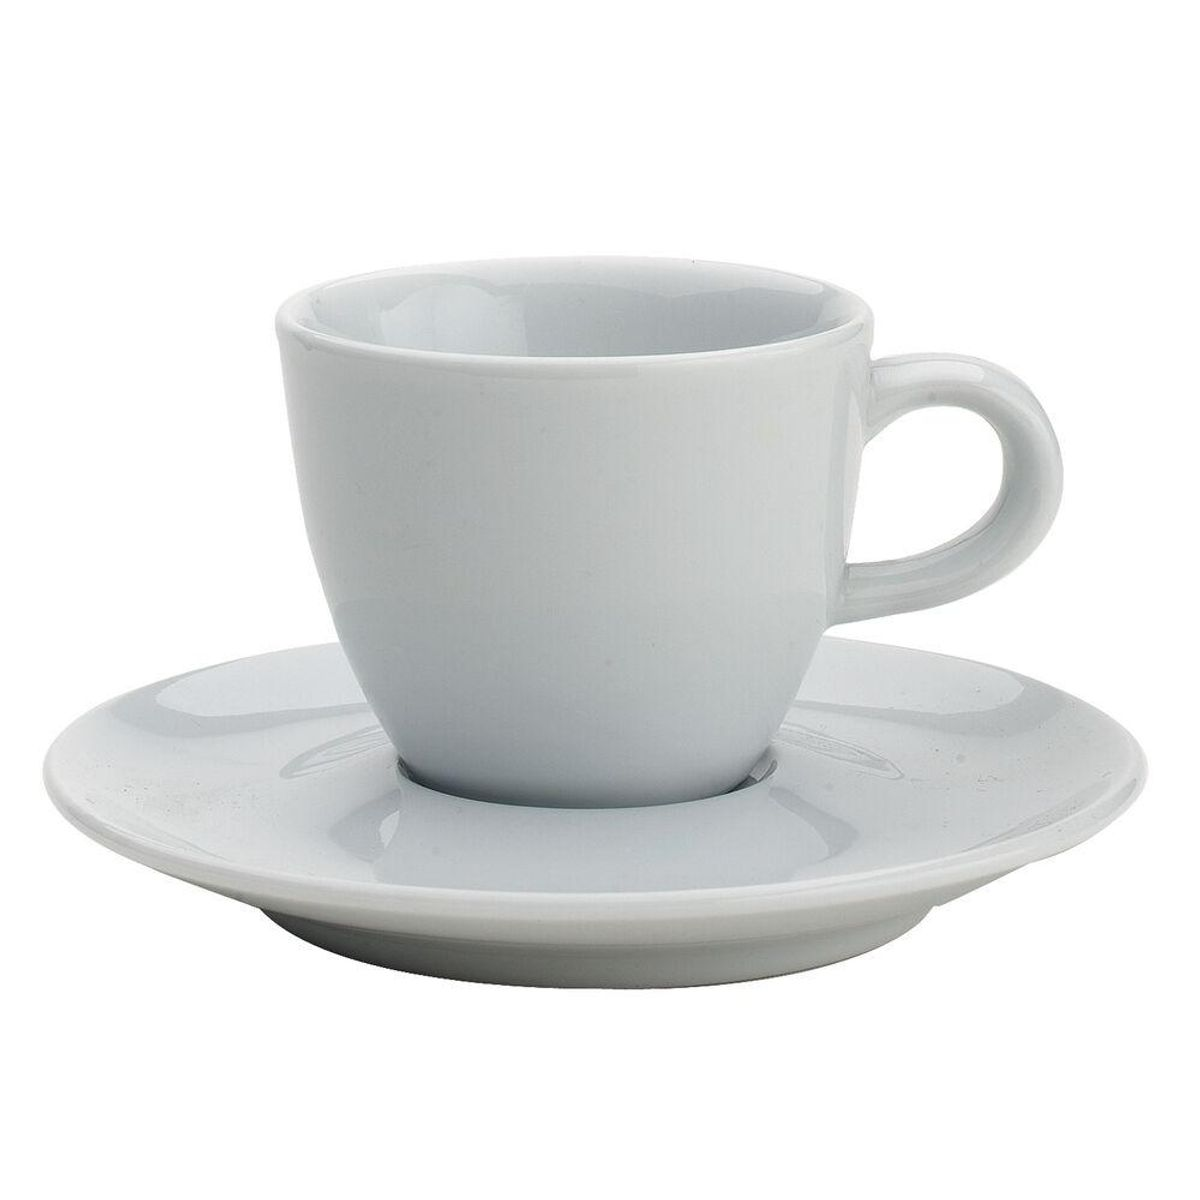 Café Collection Espresso Cup and Saucer, 2 oz